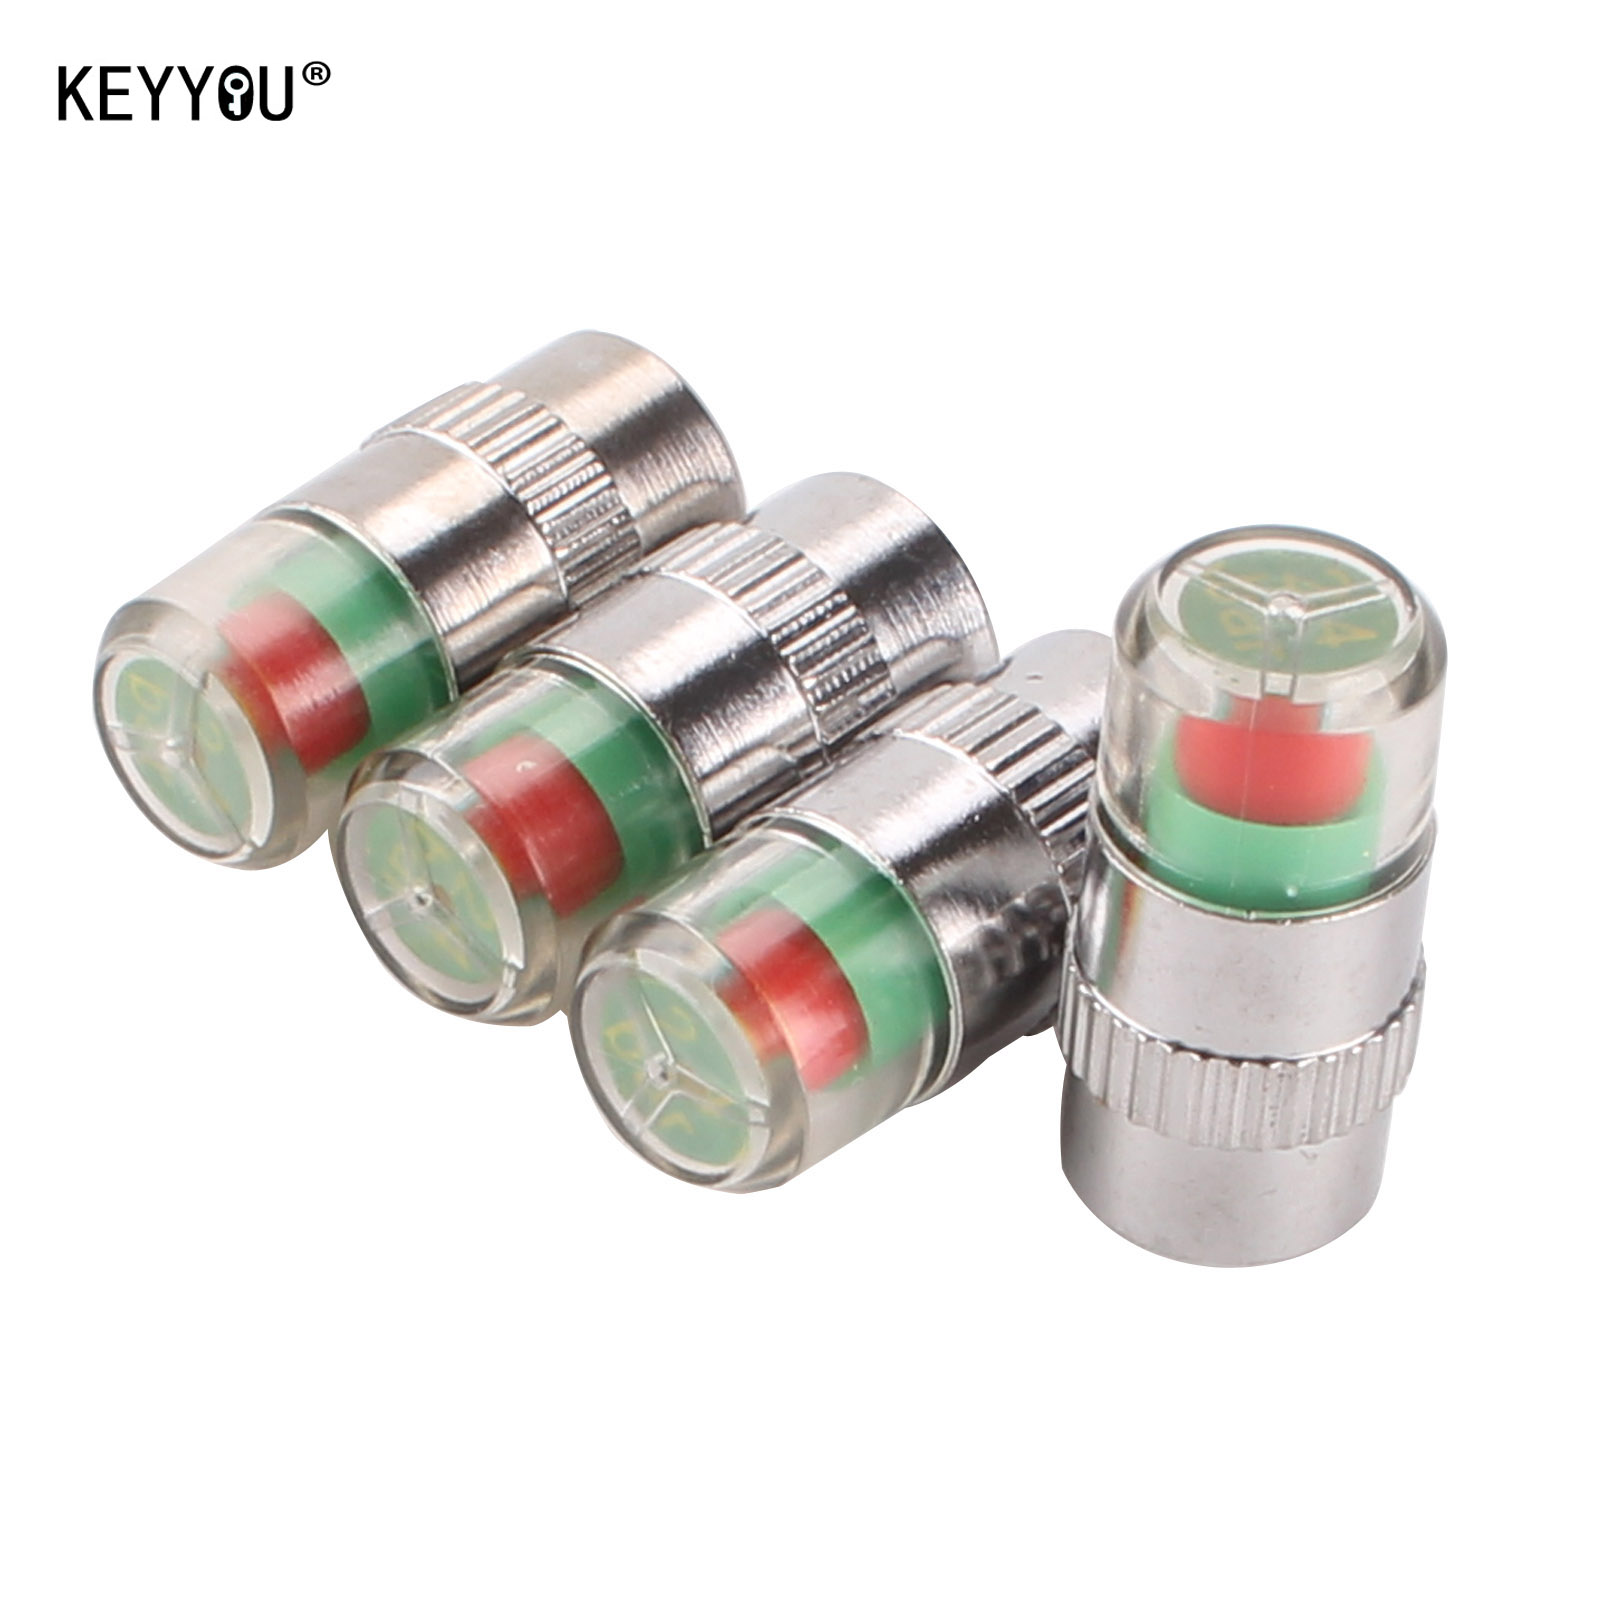 Keyyou 4pcs In 1 Set General Car Auto 2 4bar Tire Pressure